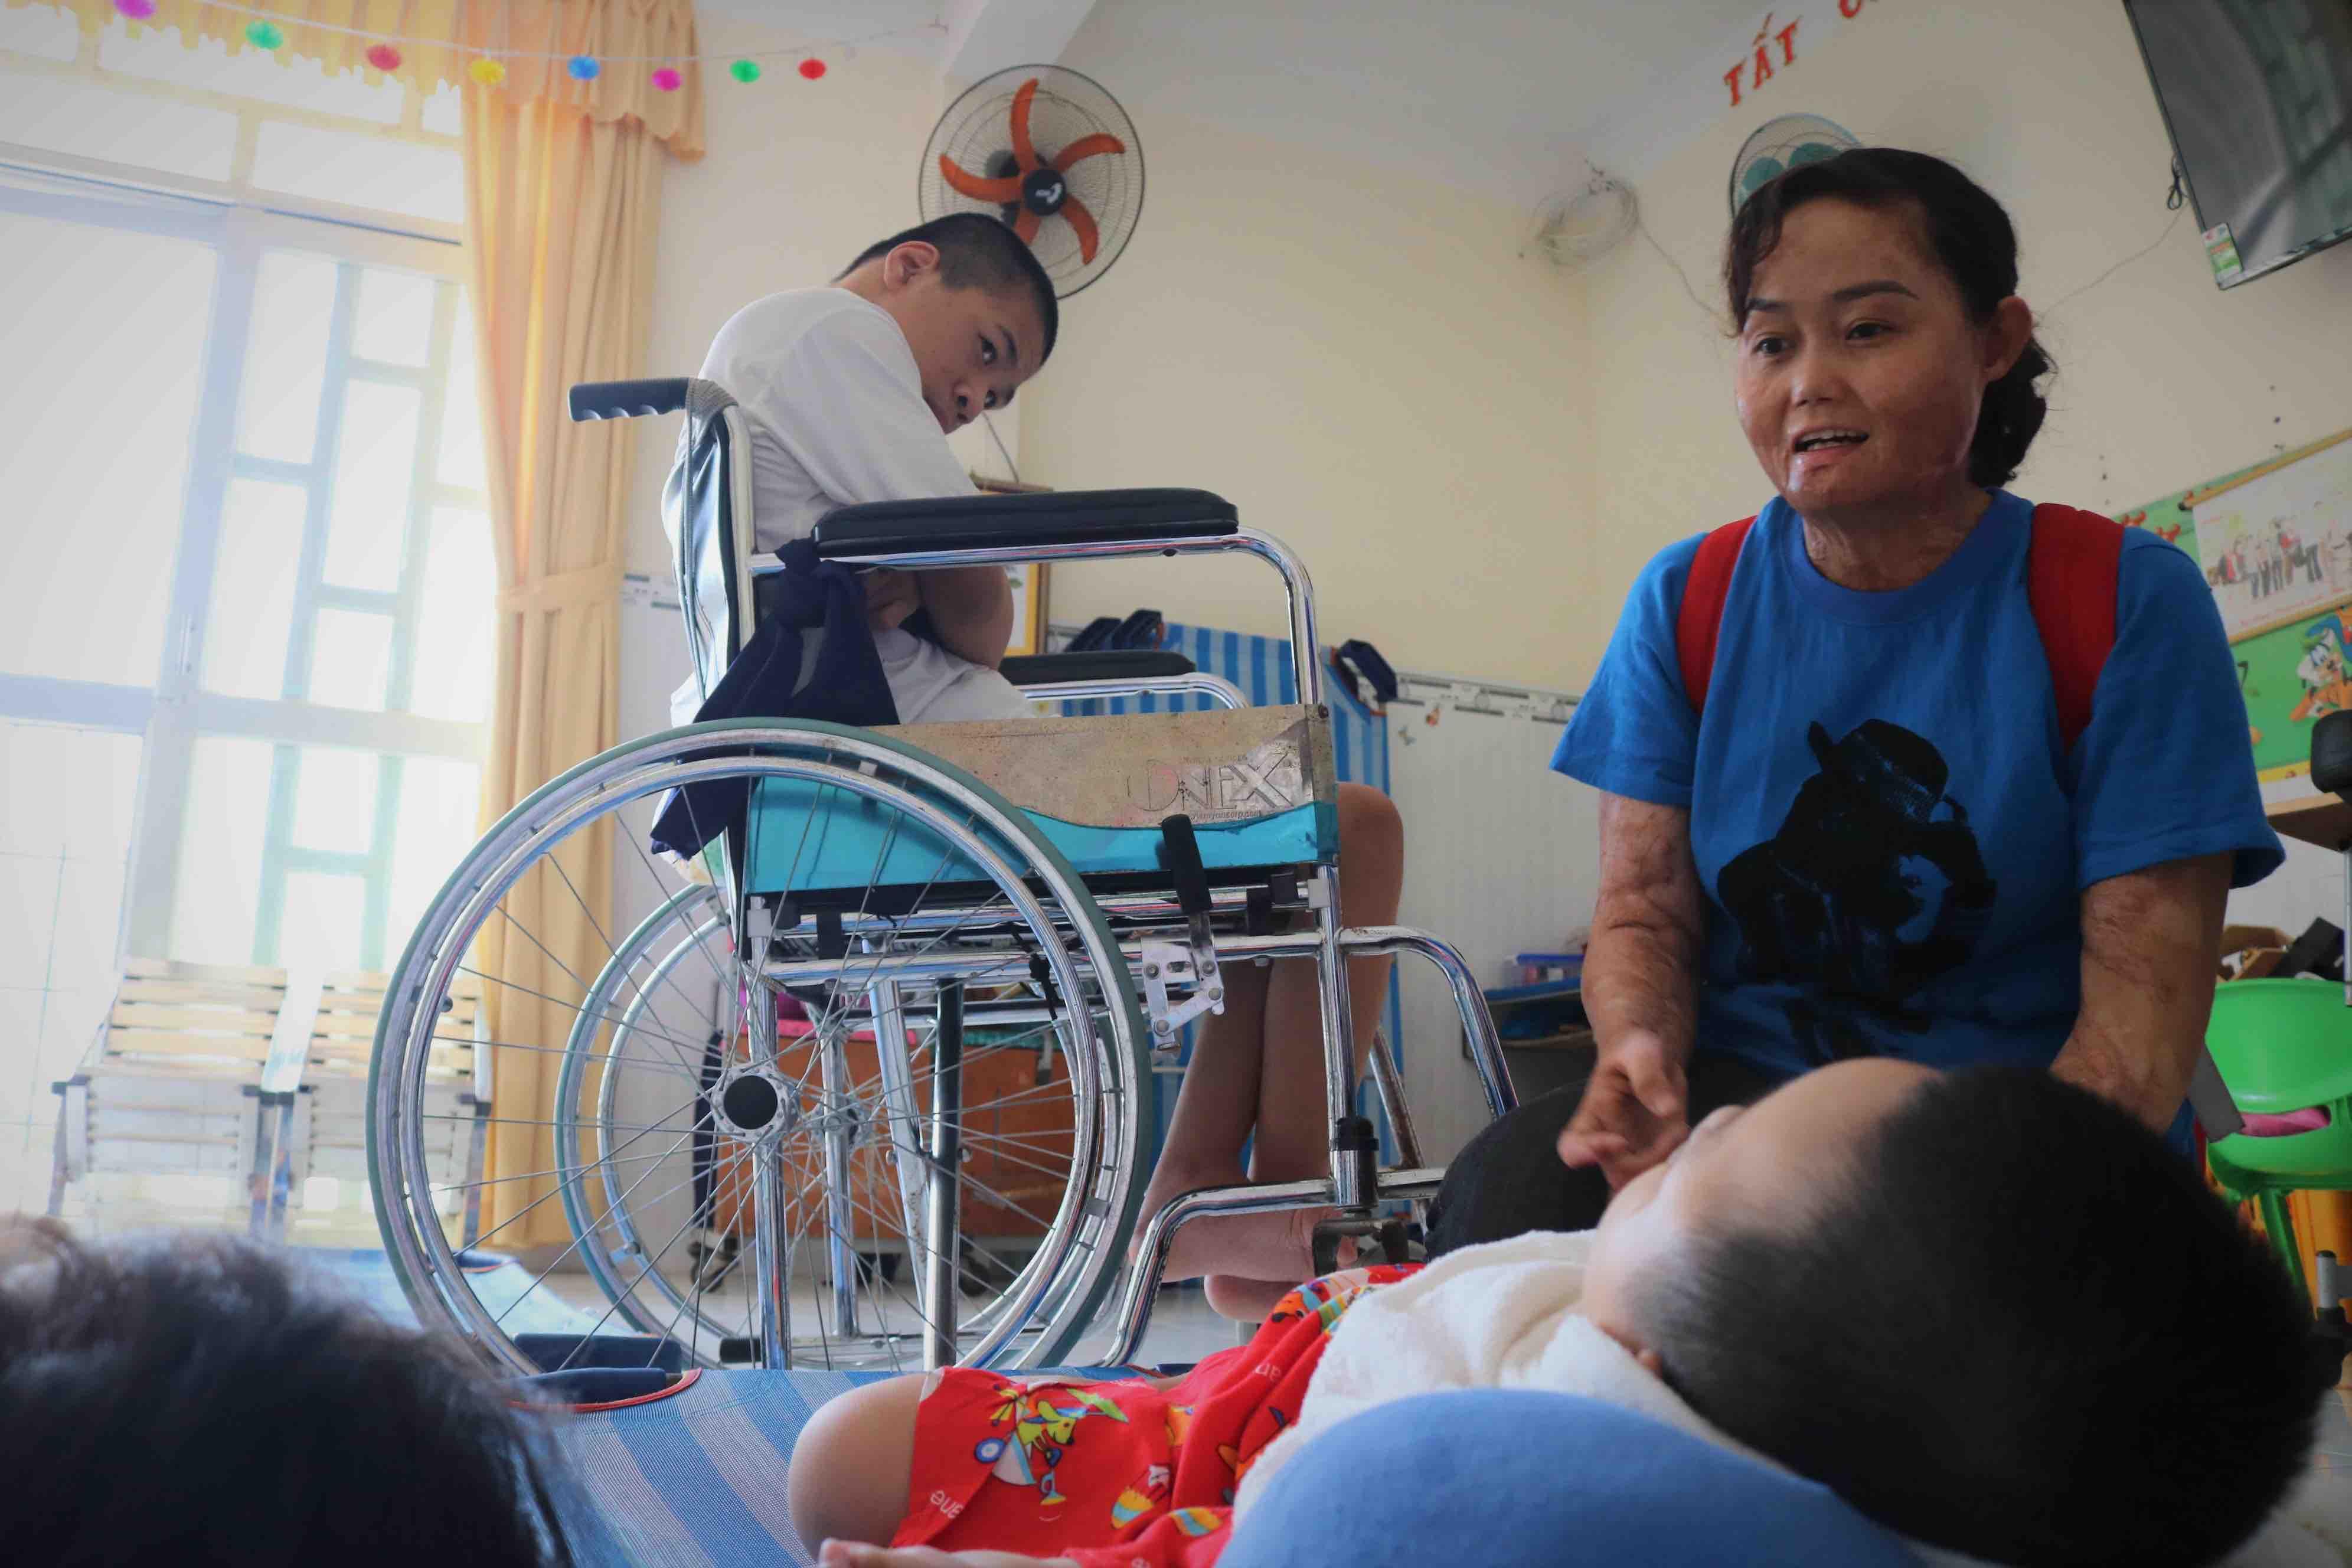 Ngan visits disadvantaged kids at an orphanage in Cu Chi District, Ho Chi Minh City. Photo: Hoang An / Tuoi Tre